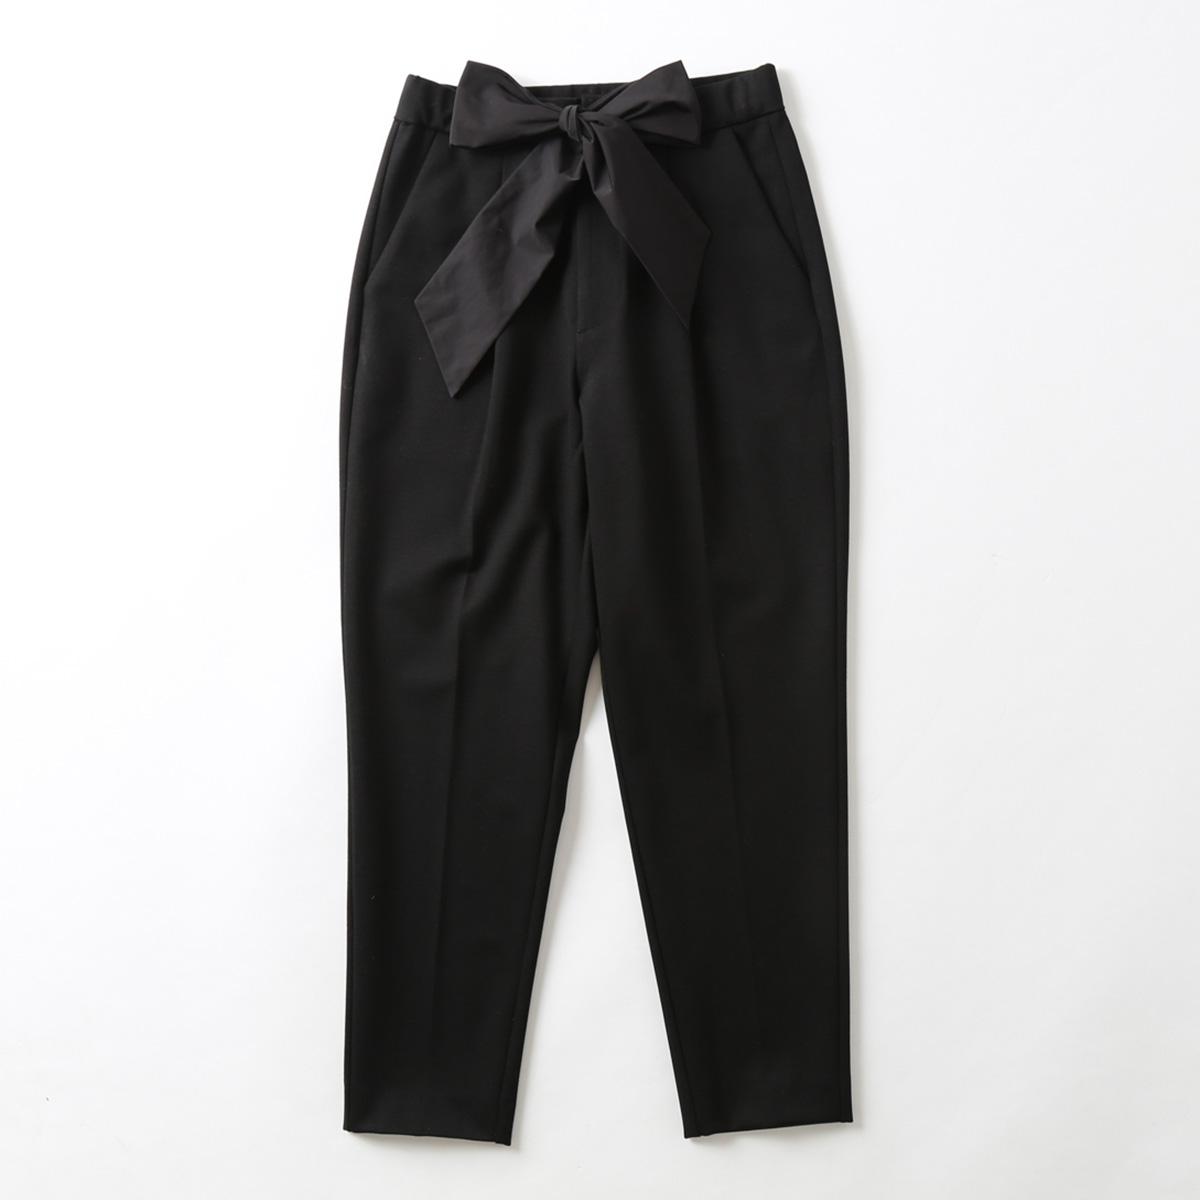 『Dress knit』Tapered Pants BLACK画像